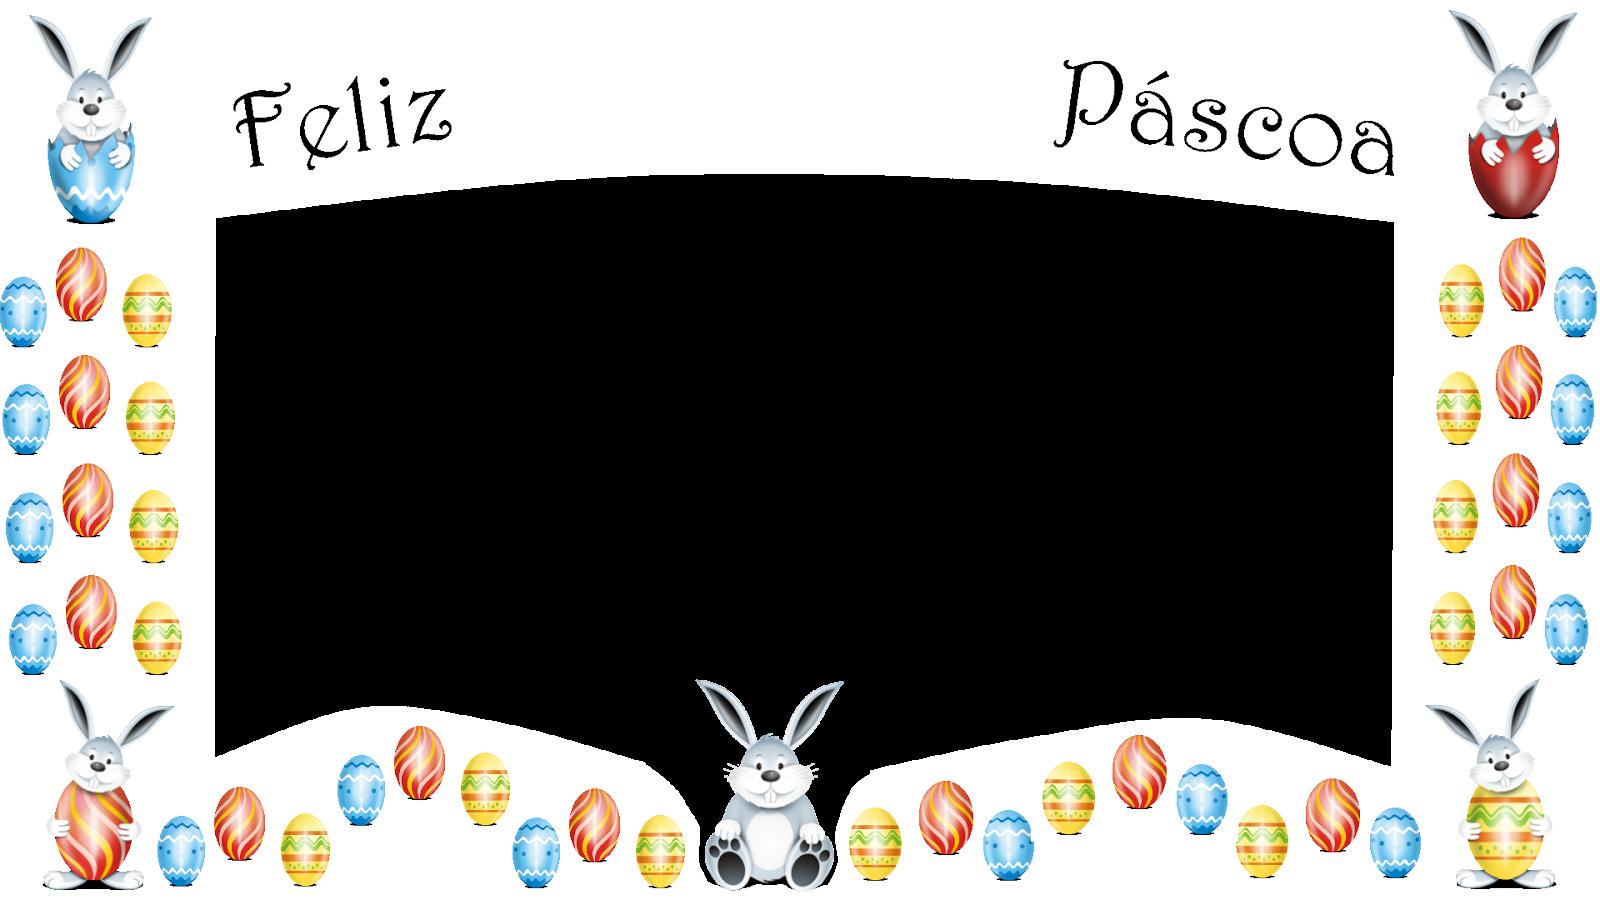 Coelhinhos e ovos-Feliz Pascoa_borda branca png